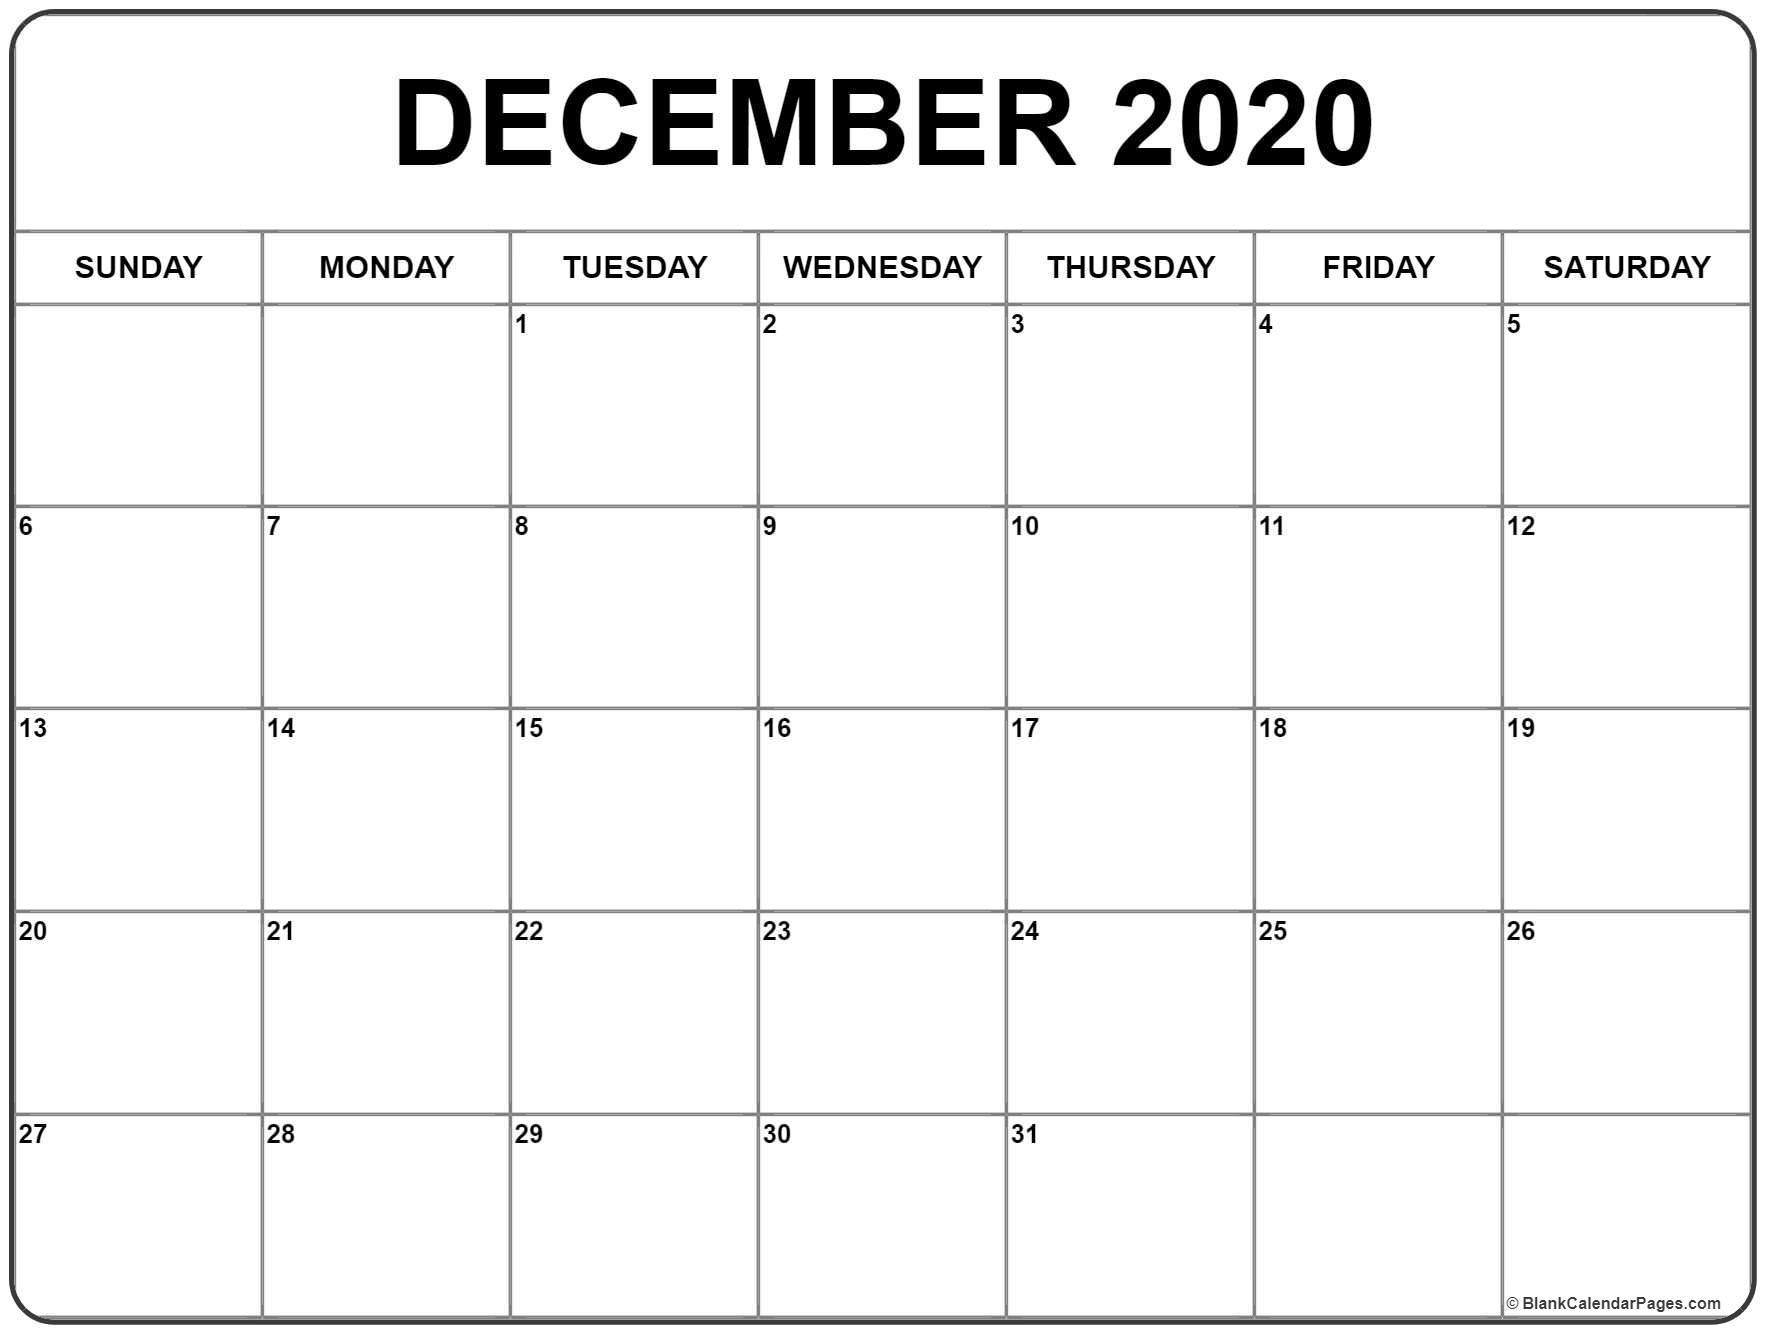 Blank Calendar December 2020  Bolan.horizonconsulting.co for Nov Dec 2020 Calendar